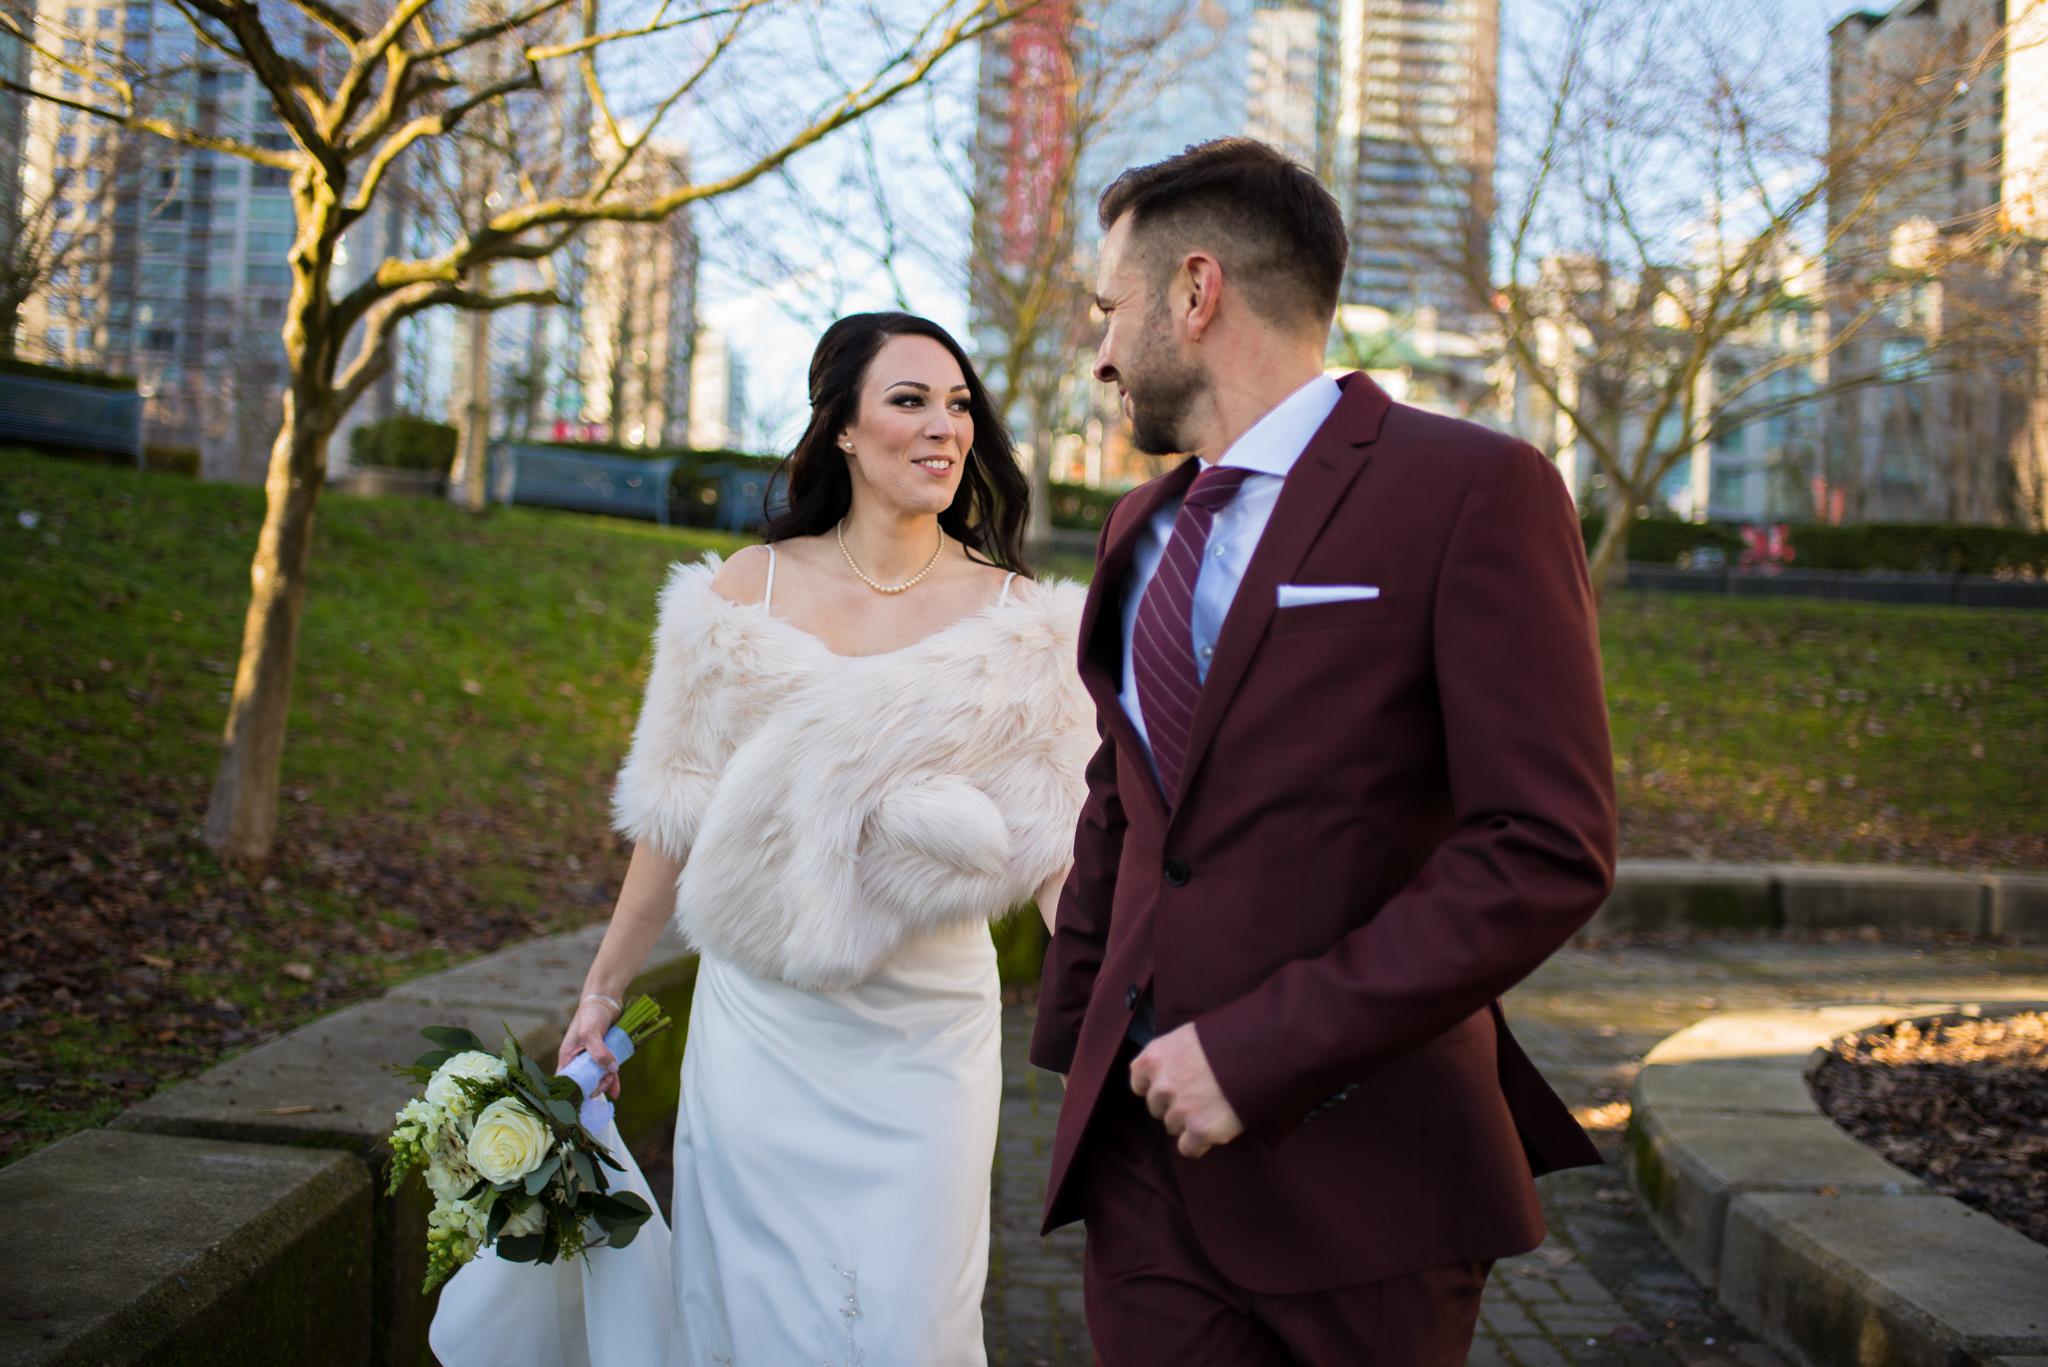 Brix and Mortar Wedding Photos-41.jpg